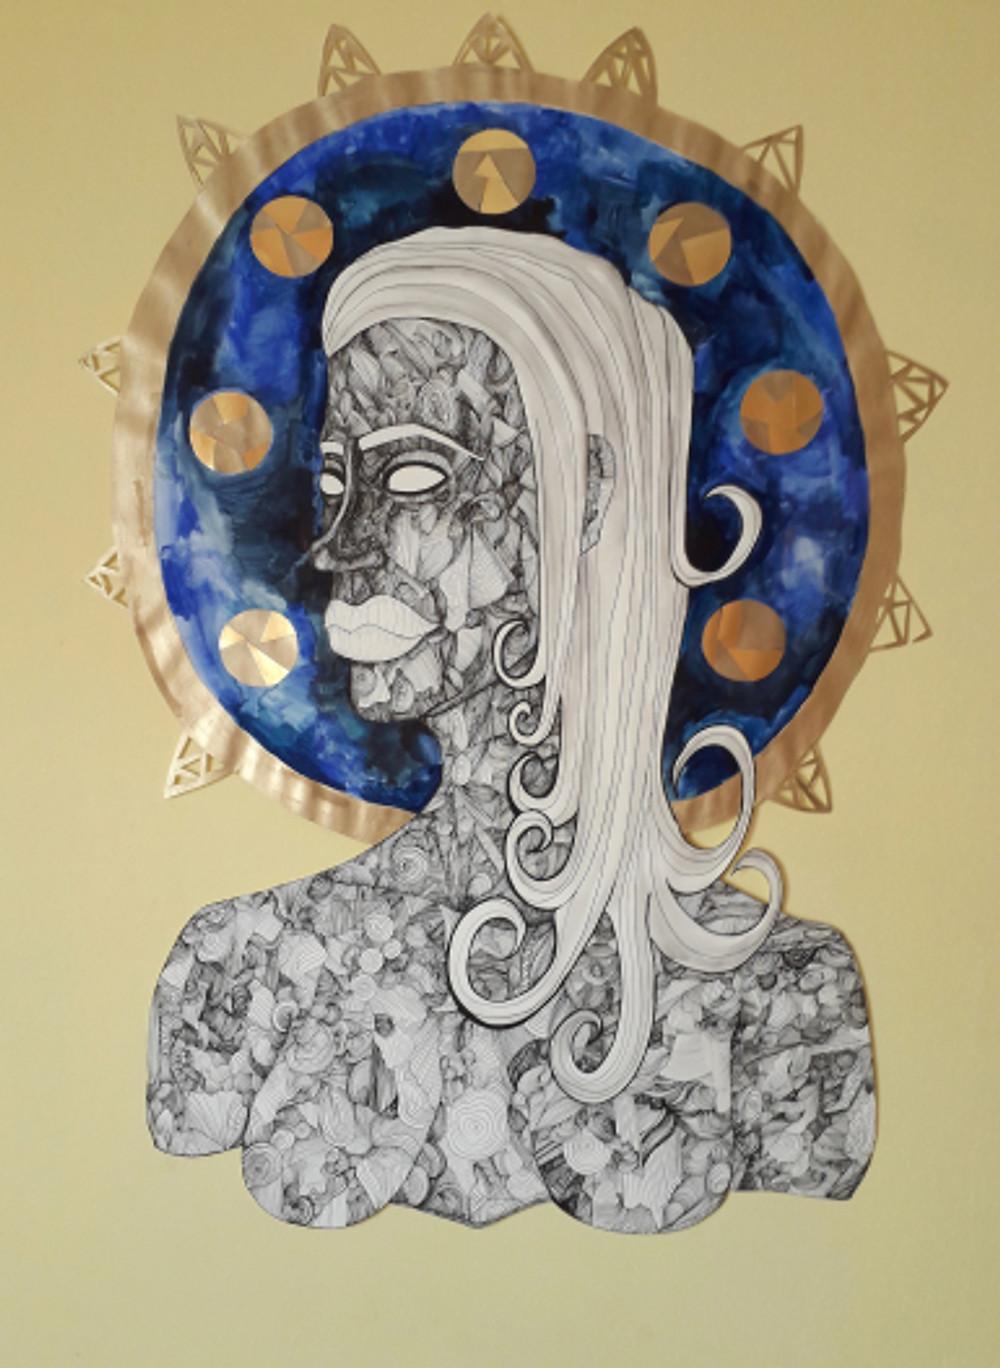 despair has no importance,100x69 cm, paper cut figure, inking pen, watercolor, 2018.jpg